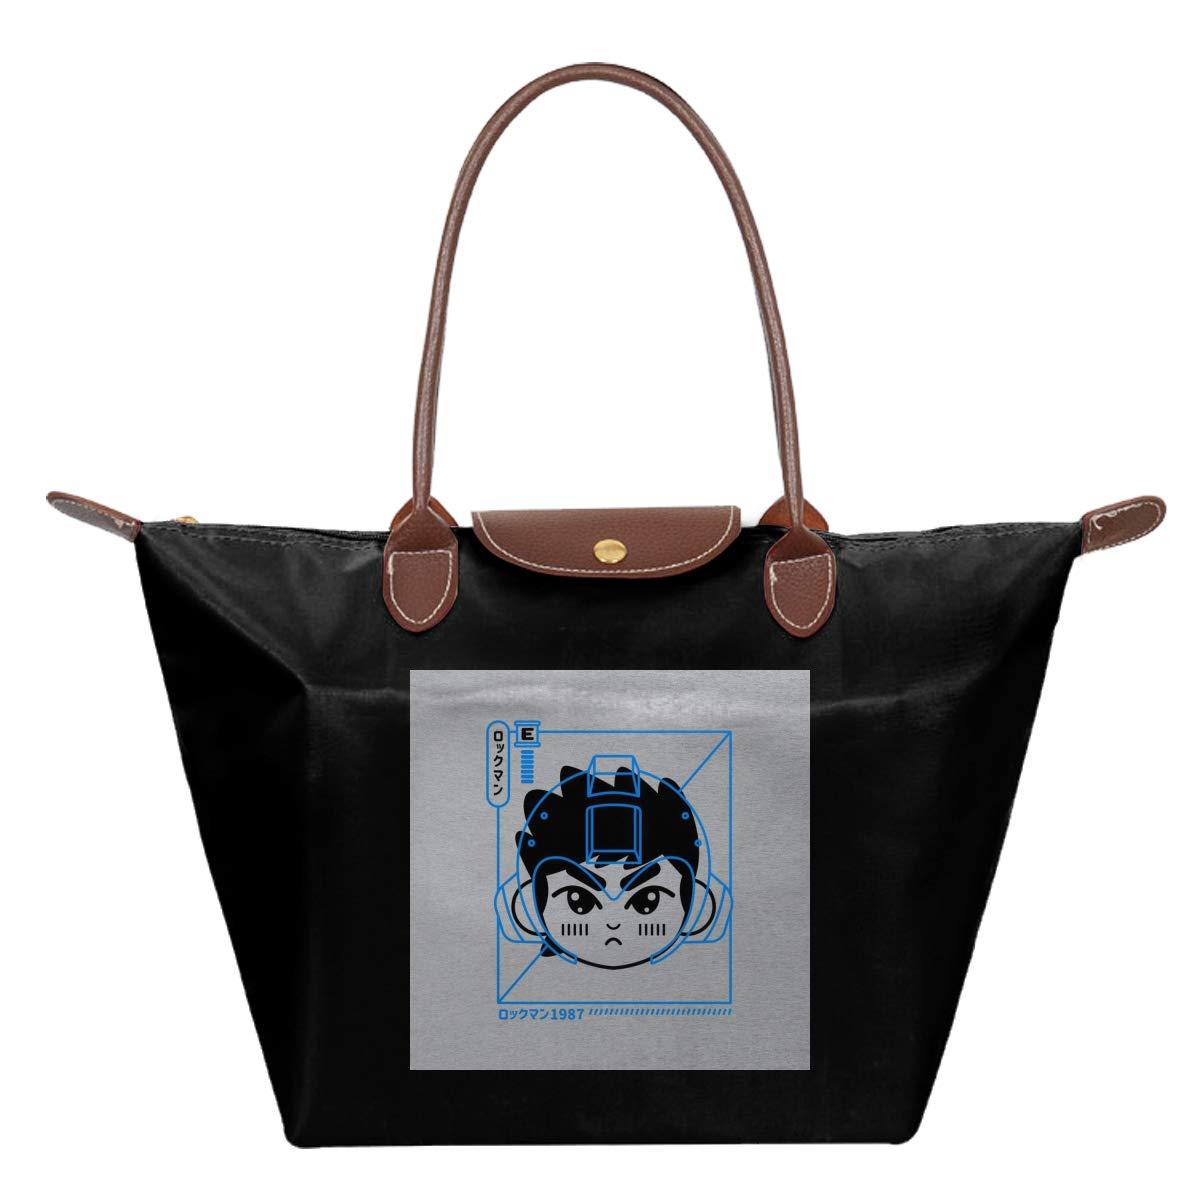 Cyber Helmet Rokkuman Mega Man Version II Waterproof Leather Folded Messenger Nylon Bag Travel Tote Hopping Folding School Handbags